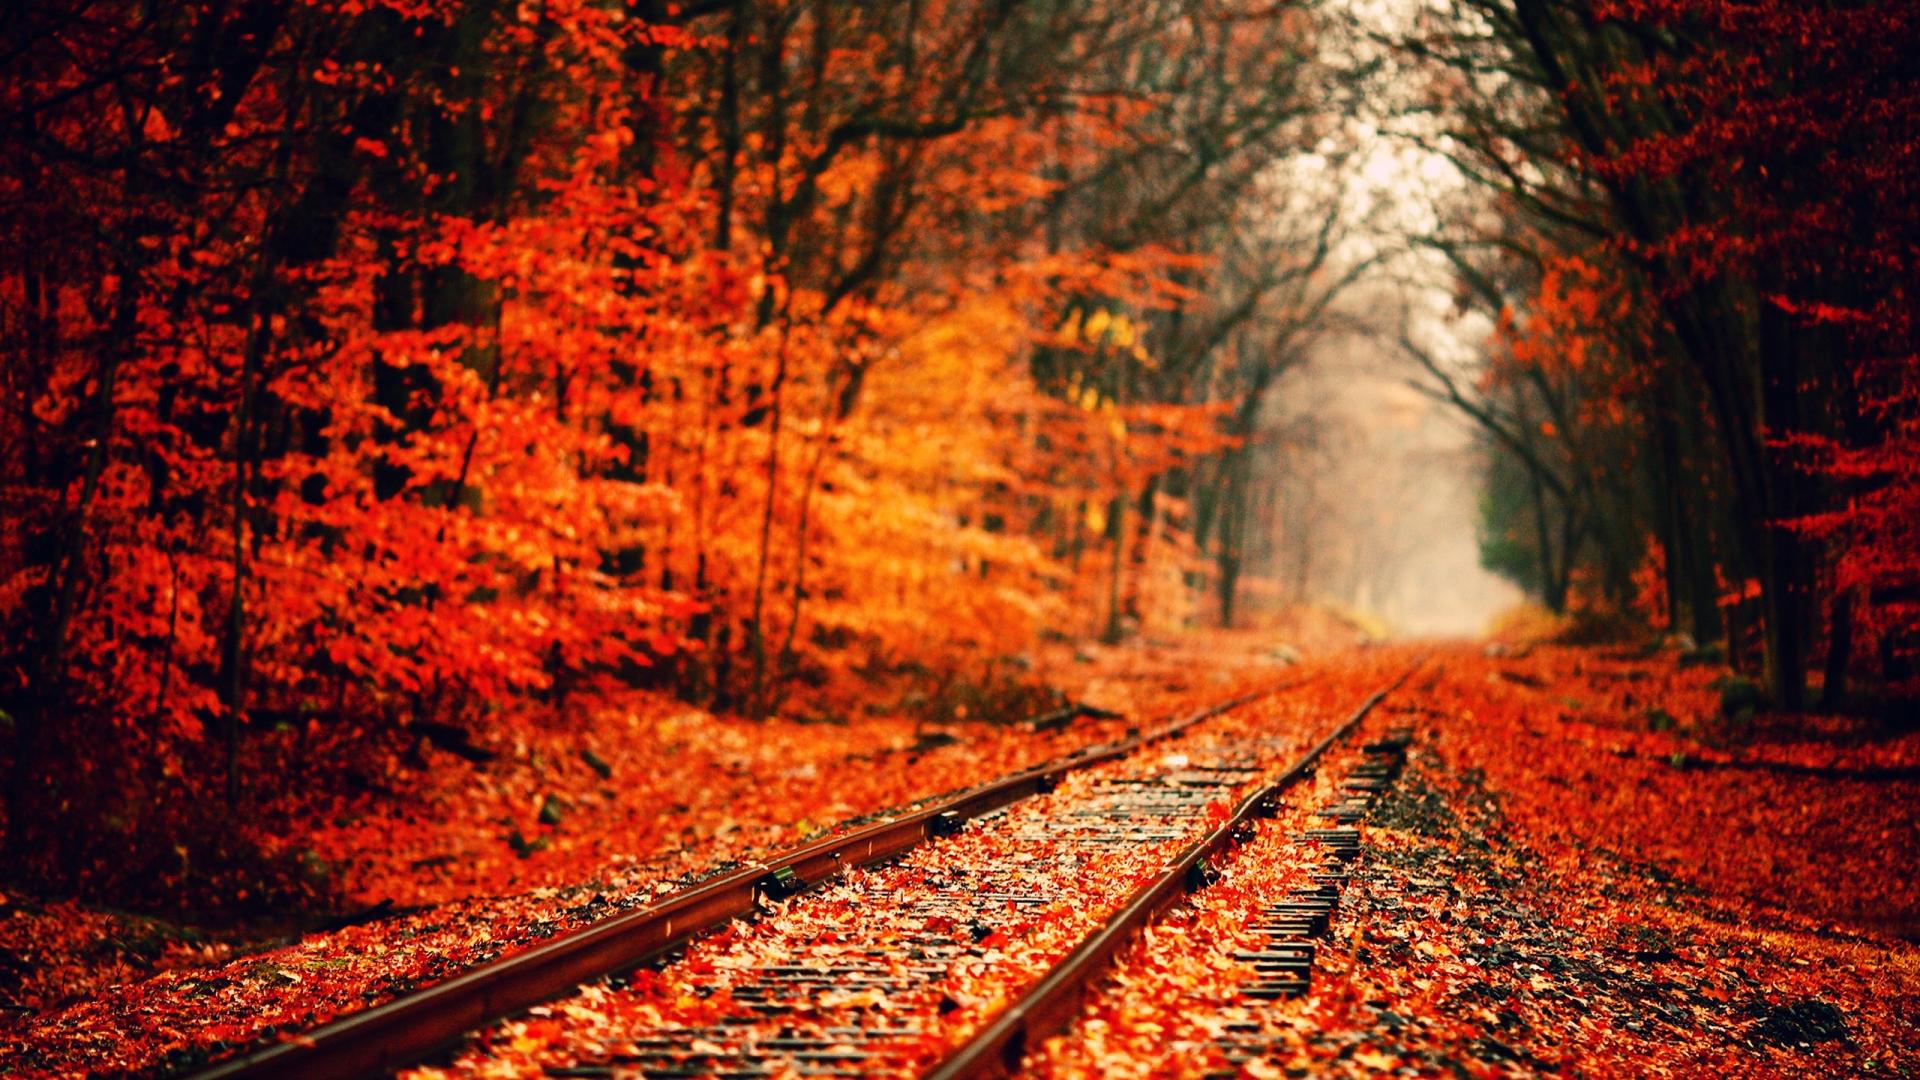 Autumn Season Hd Wallpapers Wallpaper Cave